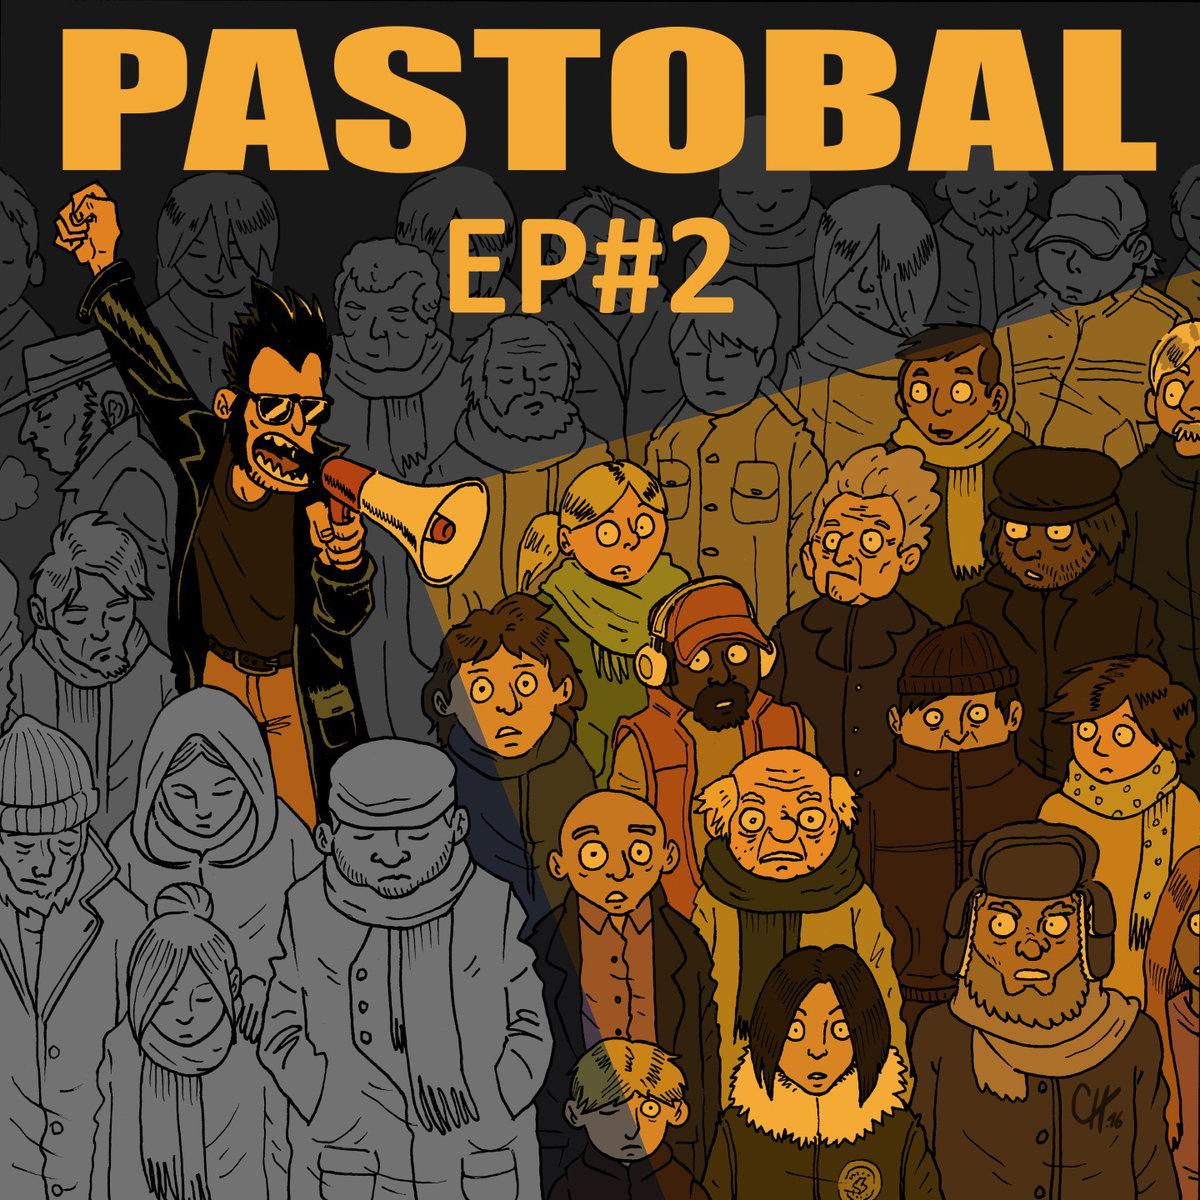 Pastobal – EP#2